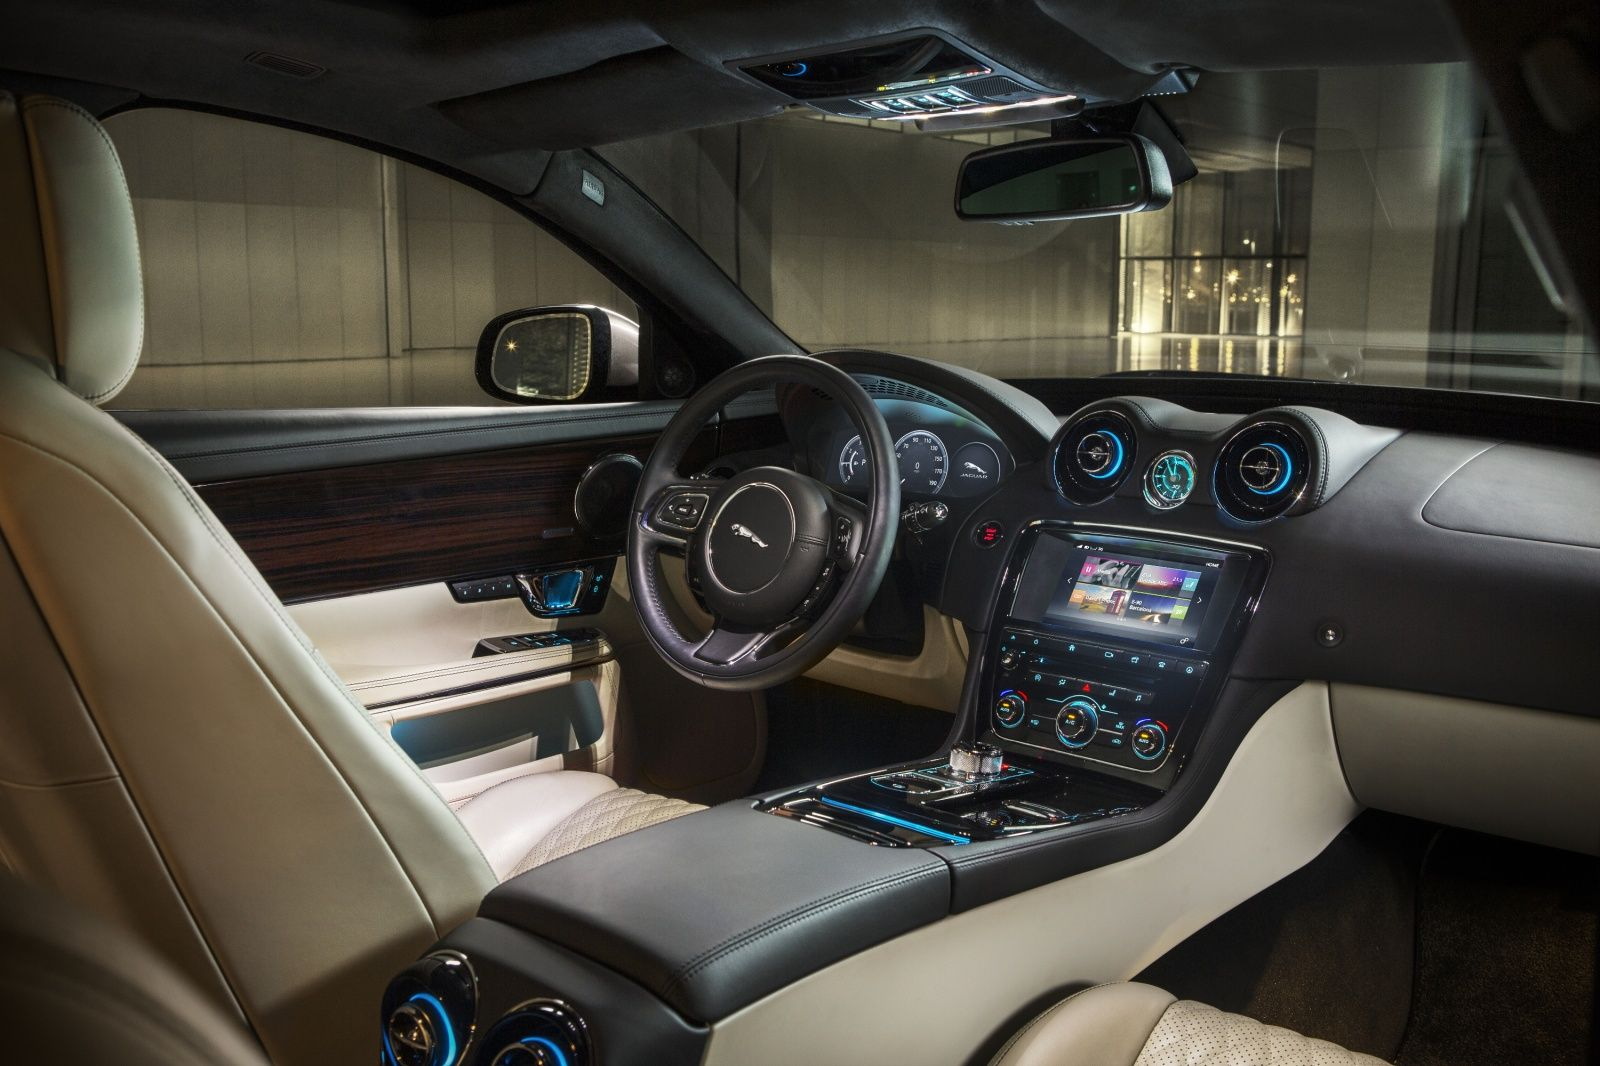 2016 Jaguar Xj Is More Desirable Than Ever Jaguar Xj New Jaguar Jaguar